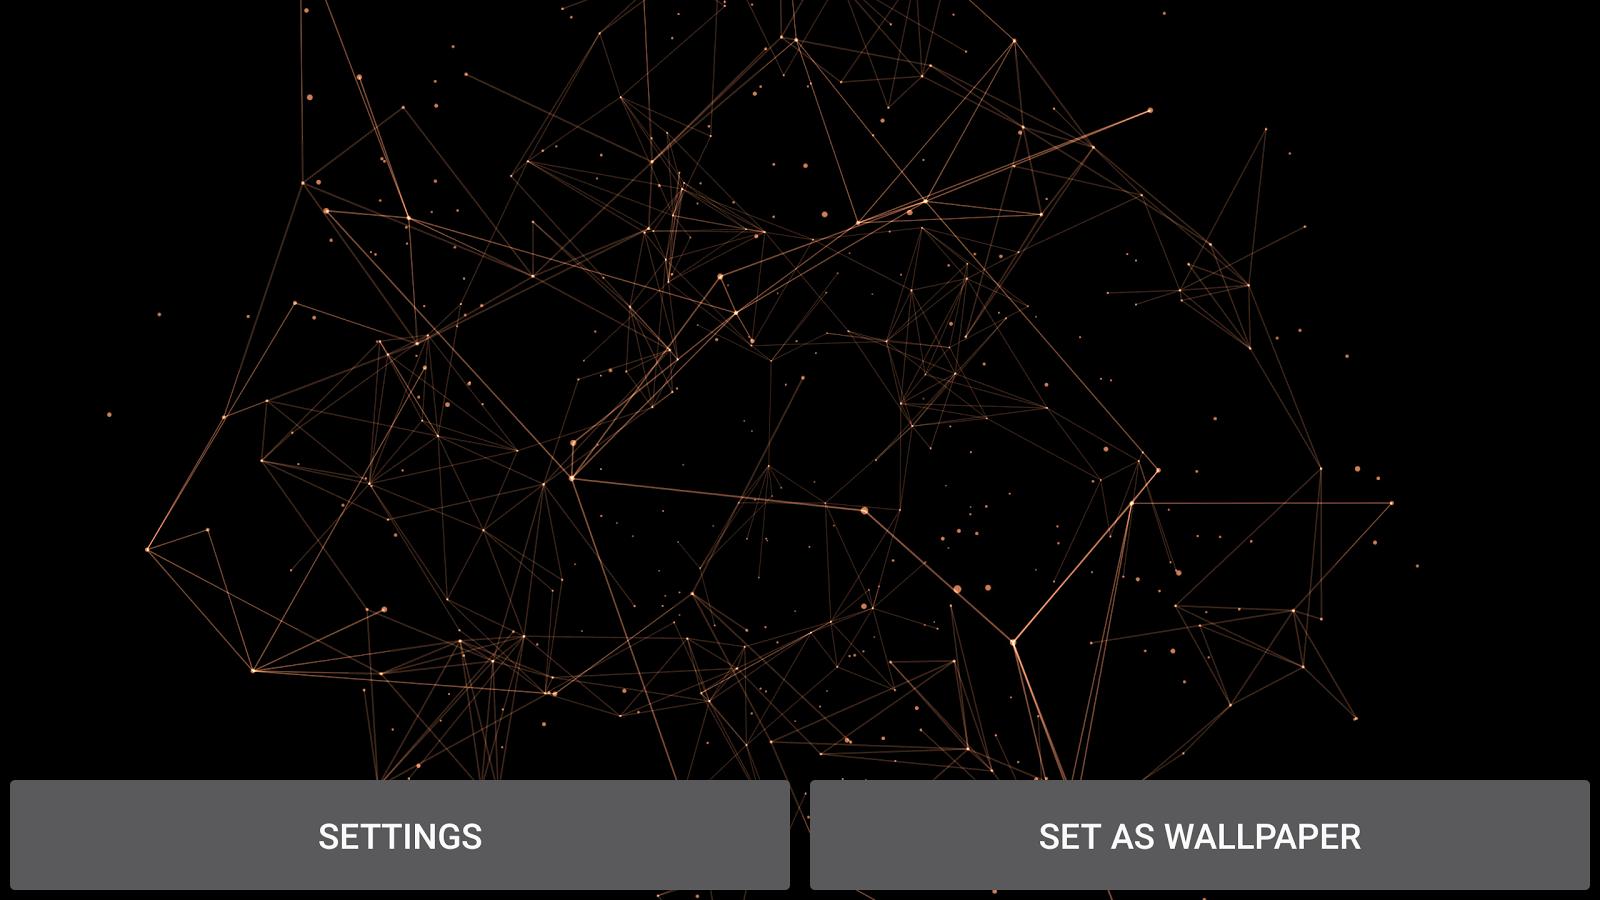 Particles Best 3d Wallpaper For Pc Android Iphone: Particle Plexus Live Wallpaper